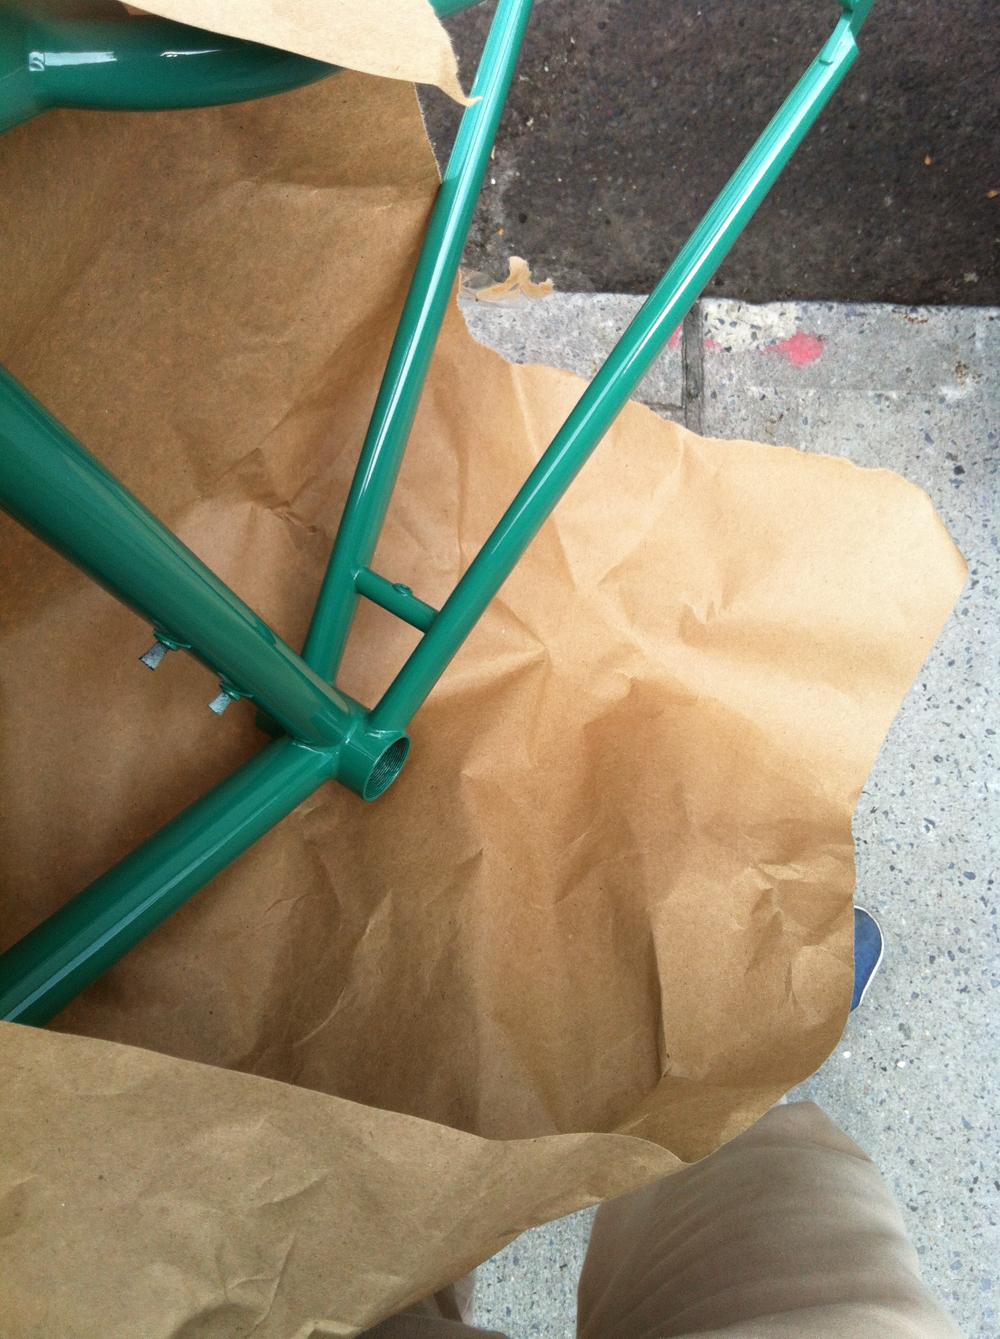 Emma's bike, back from powder. Bushwick.